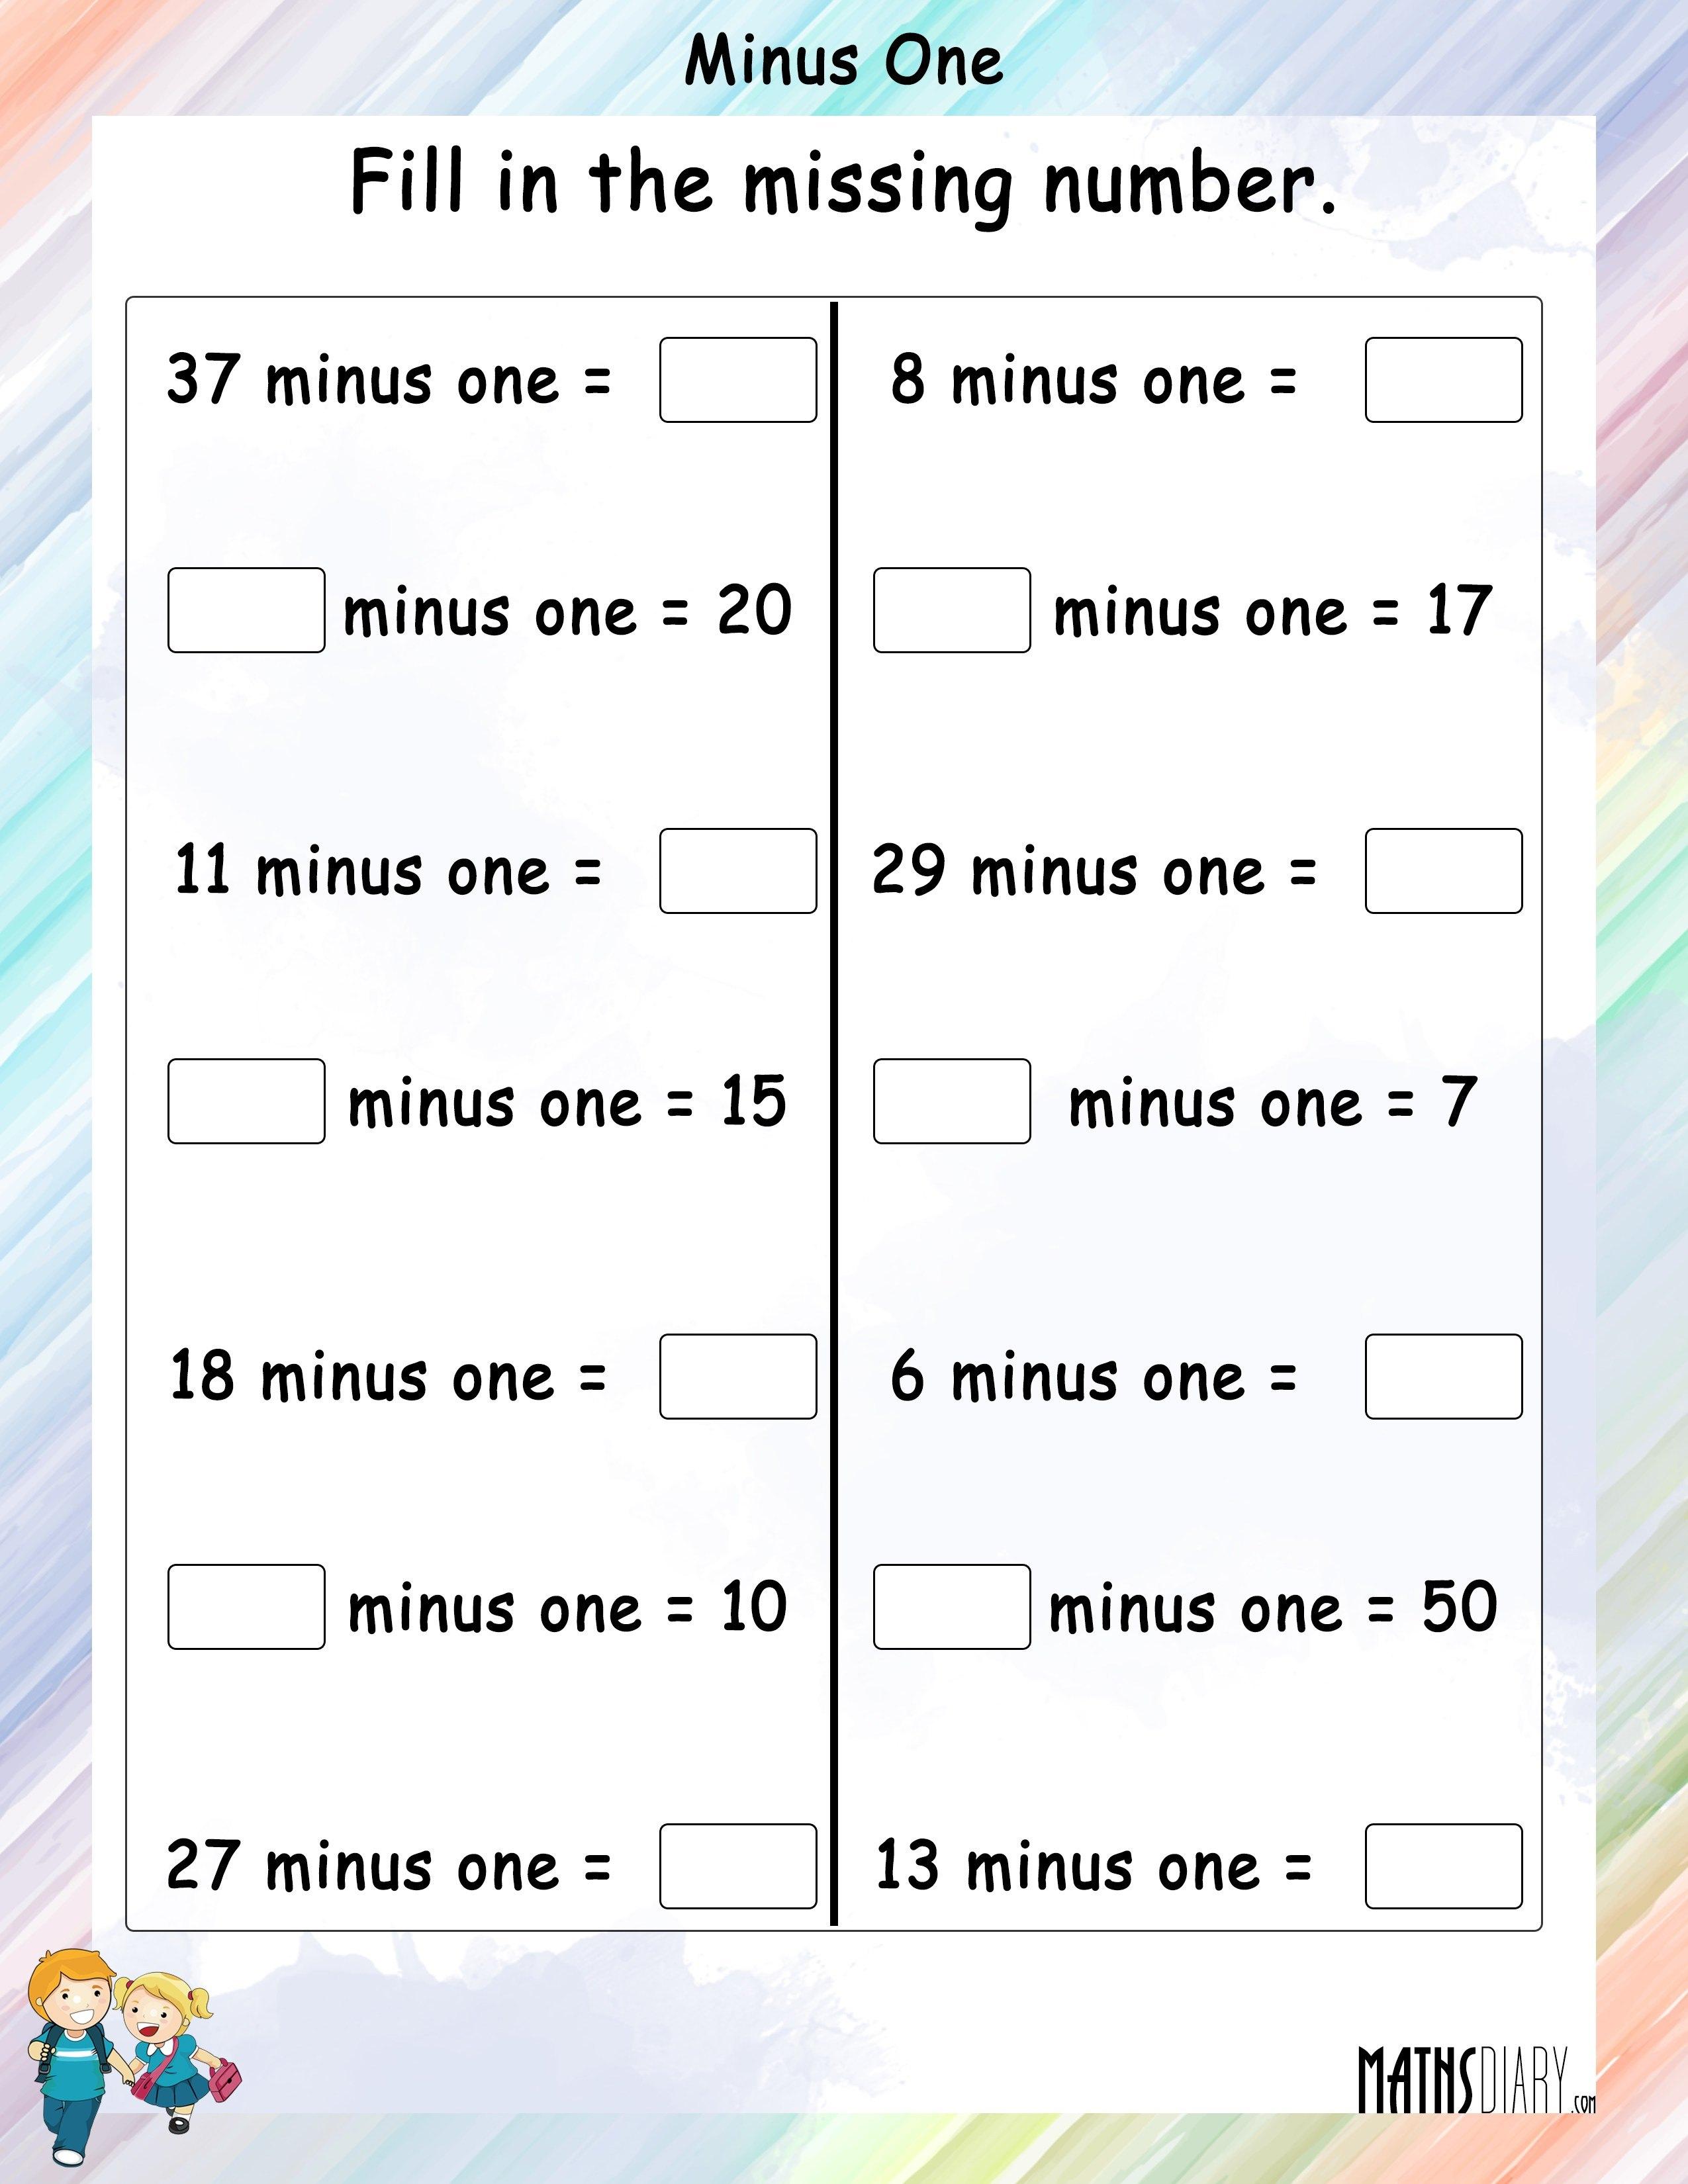 Subtracting One Minus One